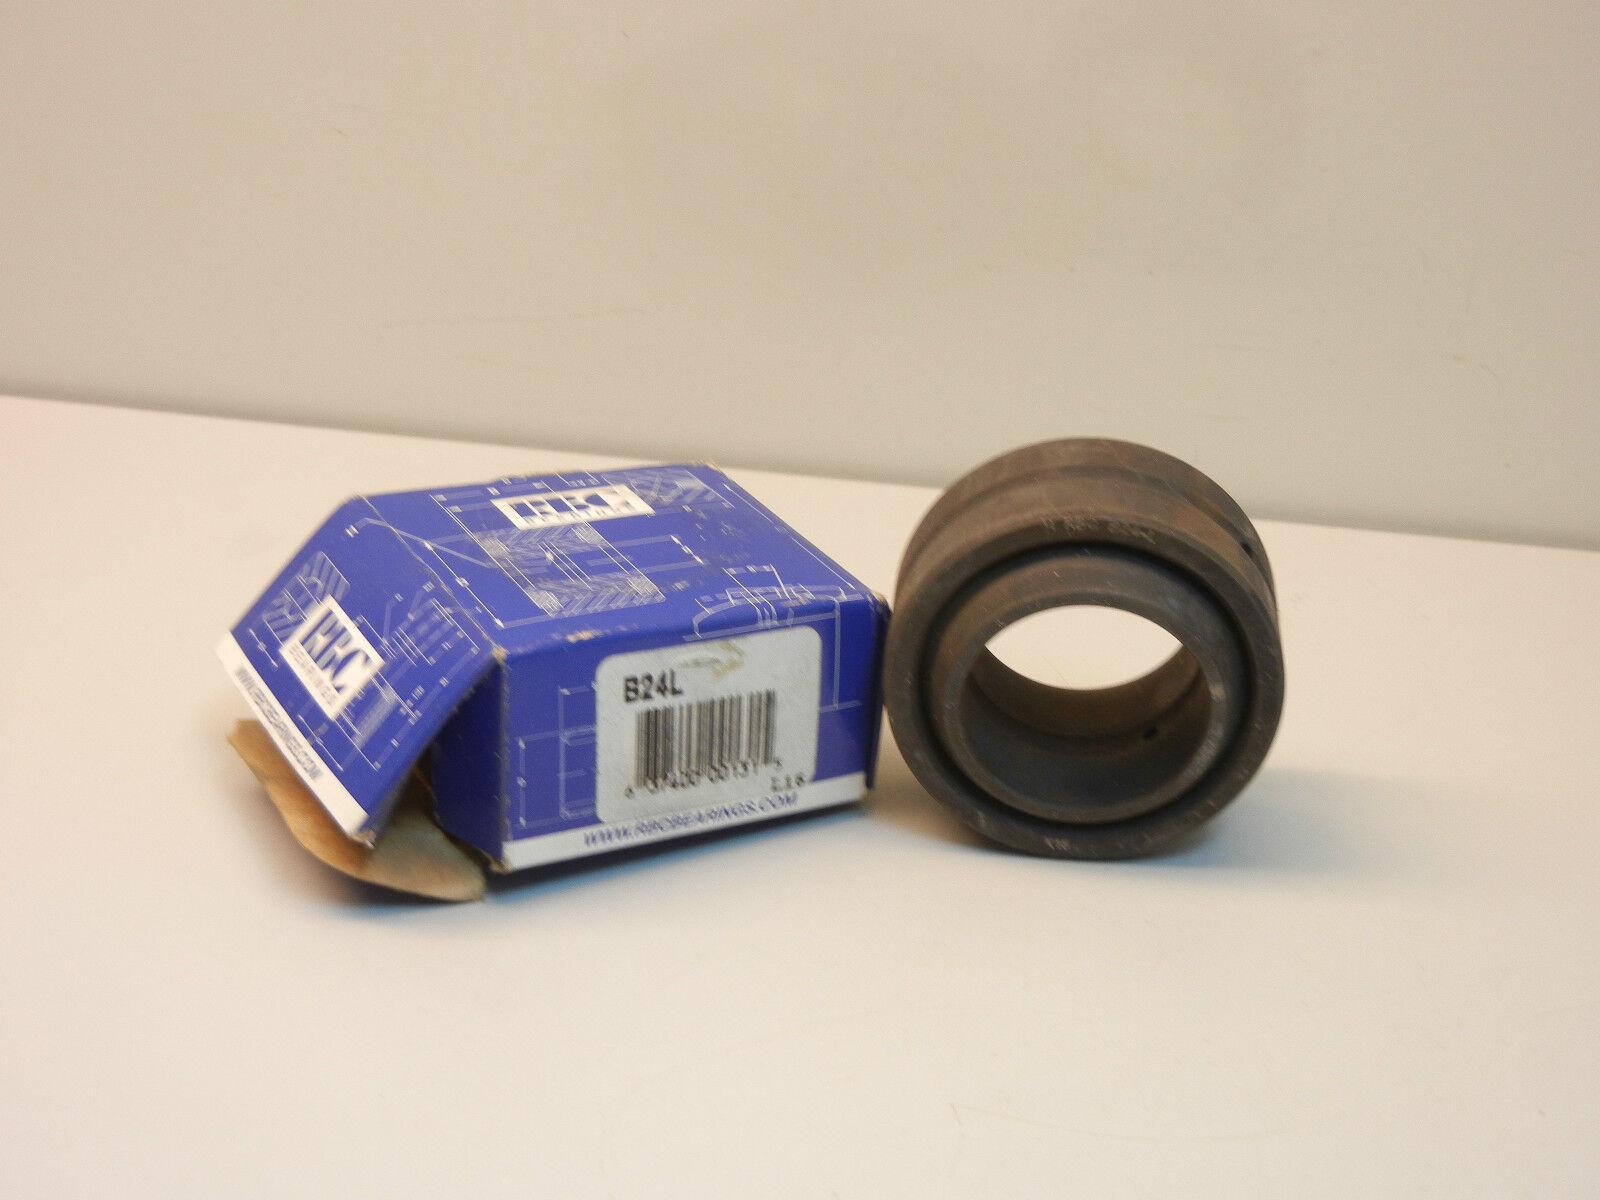 "RBC B48L Sealed Spherical Plain Bearing 3"" x 4-3//4"" x 2-5//8"" HeimBushing C7S4"